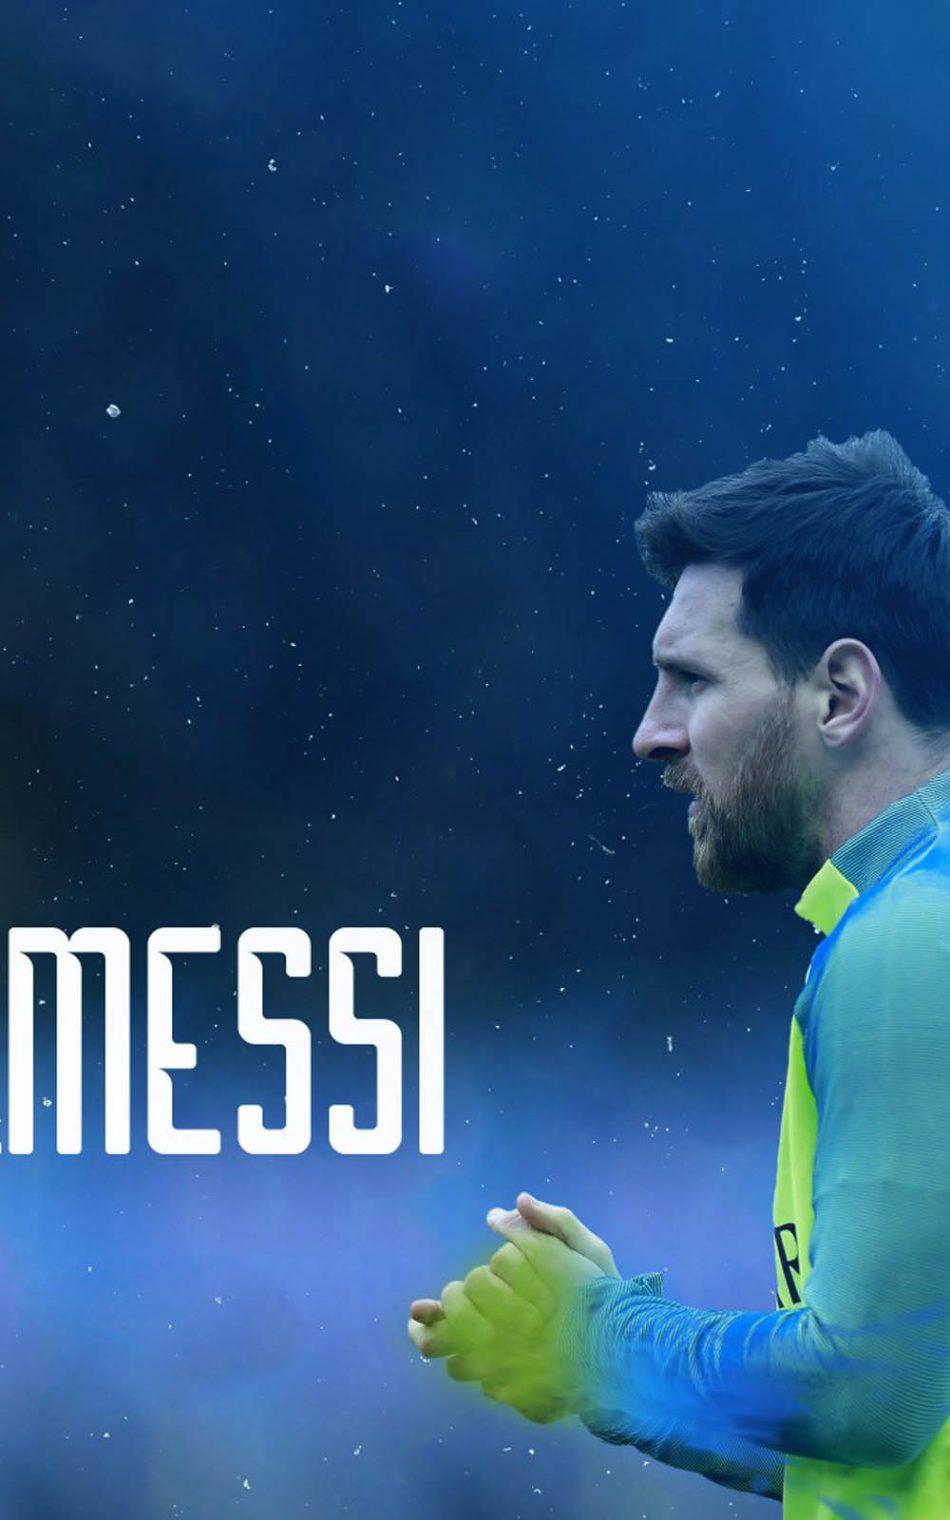 Lionel Messi 2017 4K Ultra HD Mobile Wallpaper 950x1520